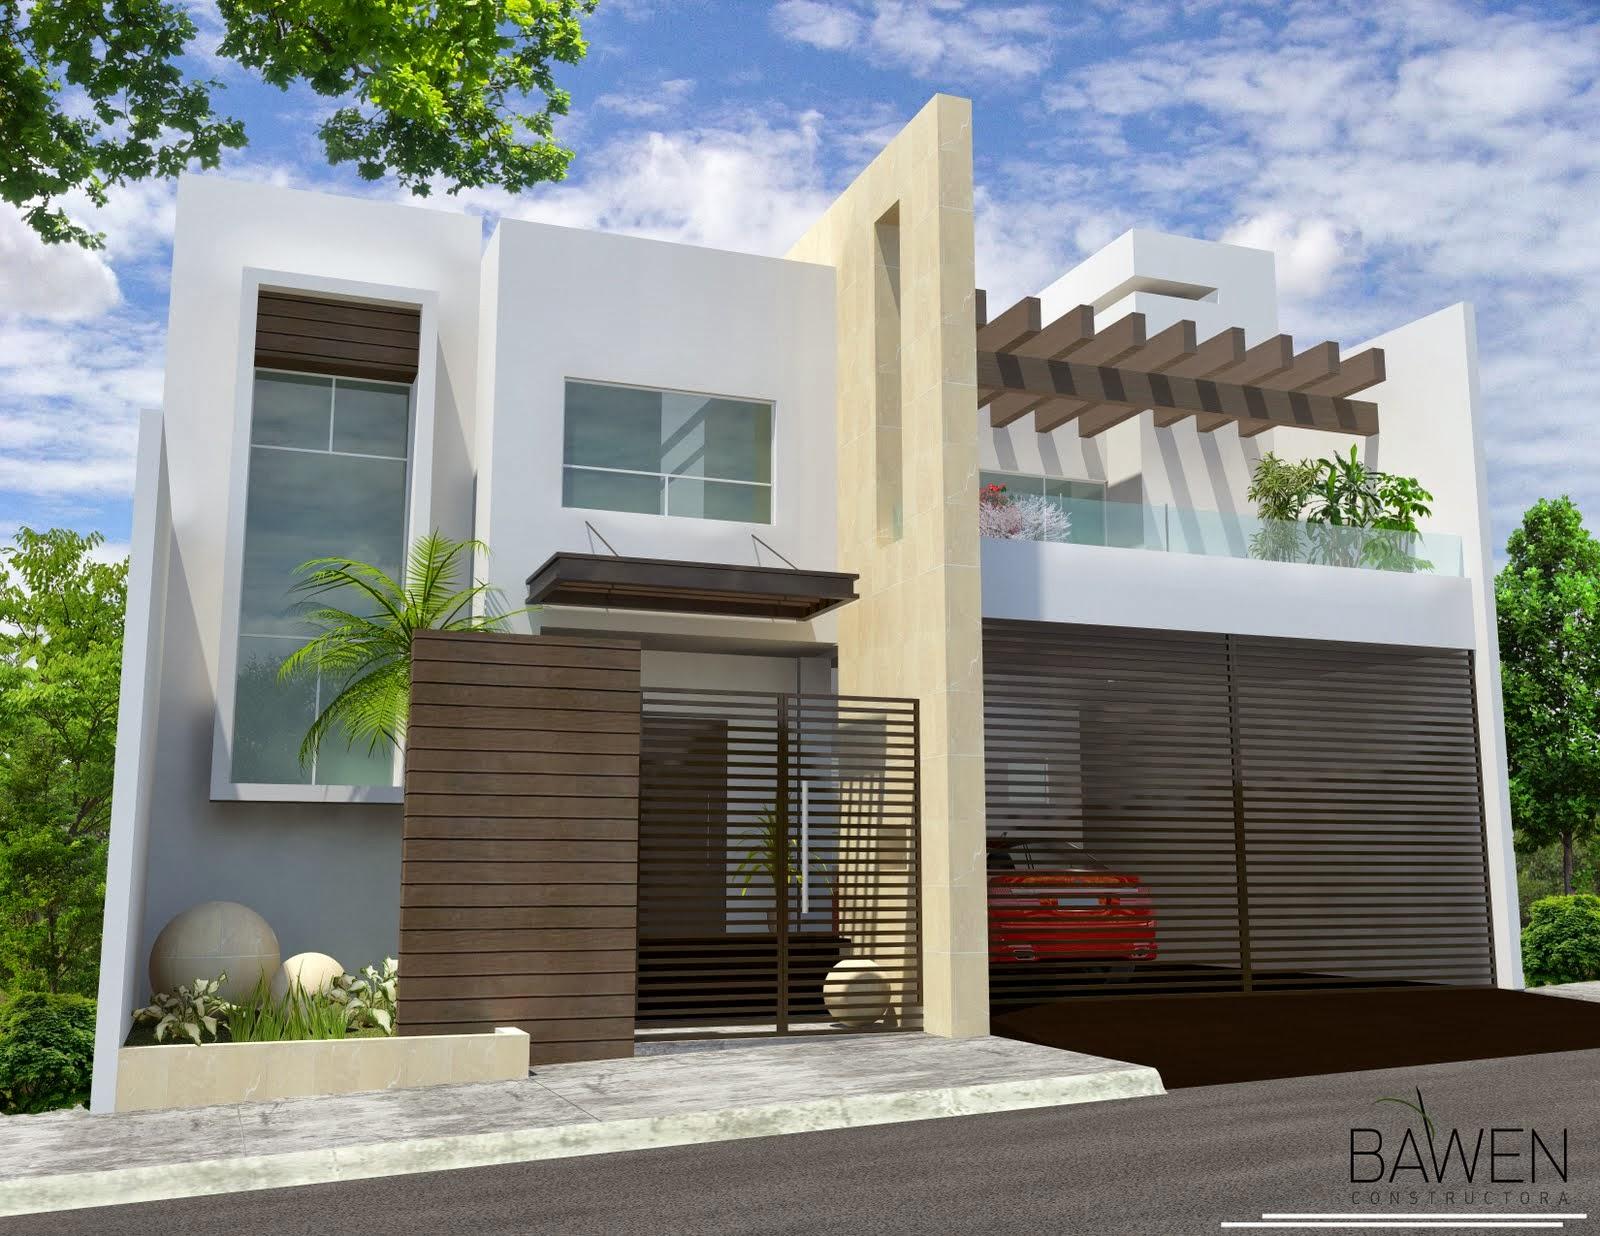 Fachadas minimalistas fachada minimalista con balcon al for Planos de oficinas pequenas modernas